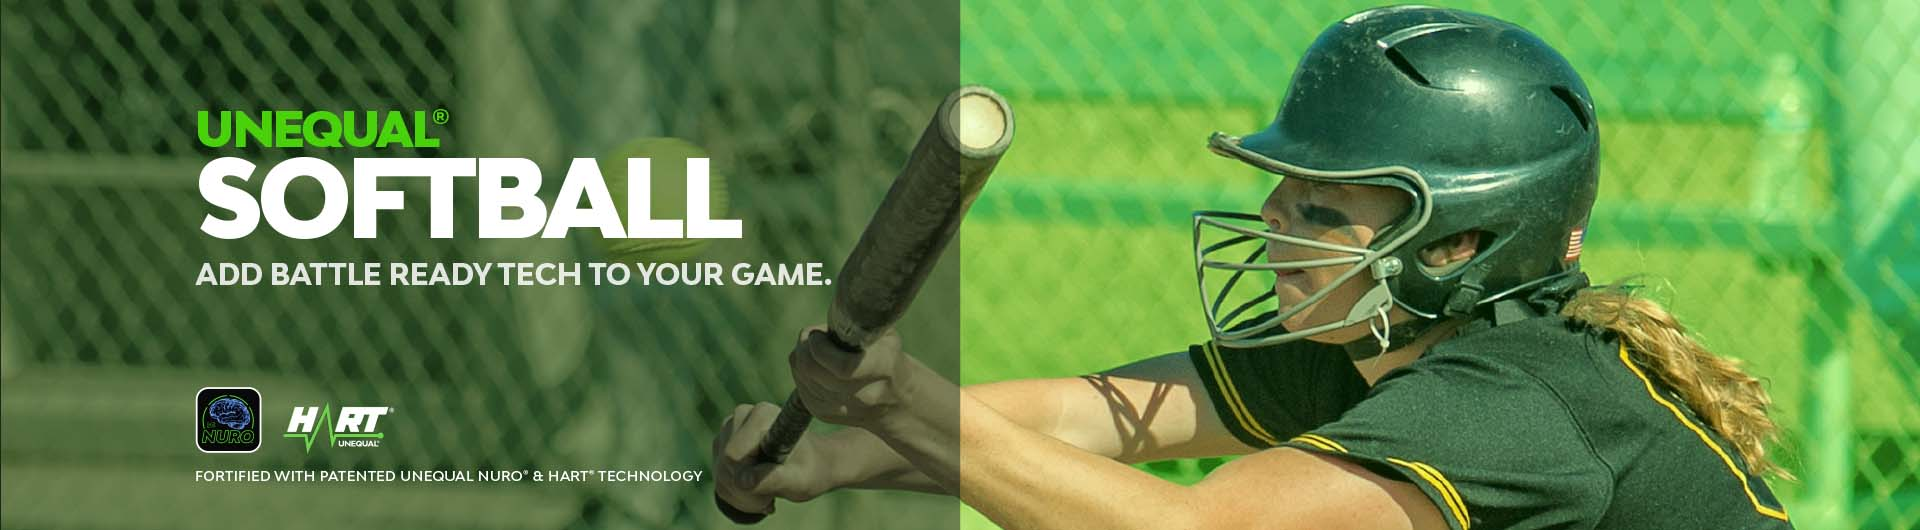 softball head heart protection